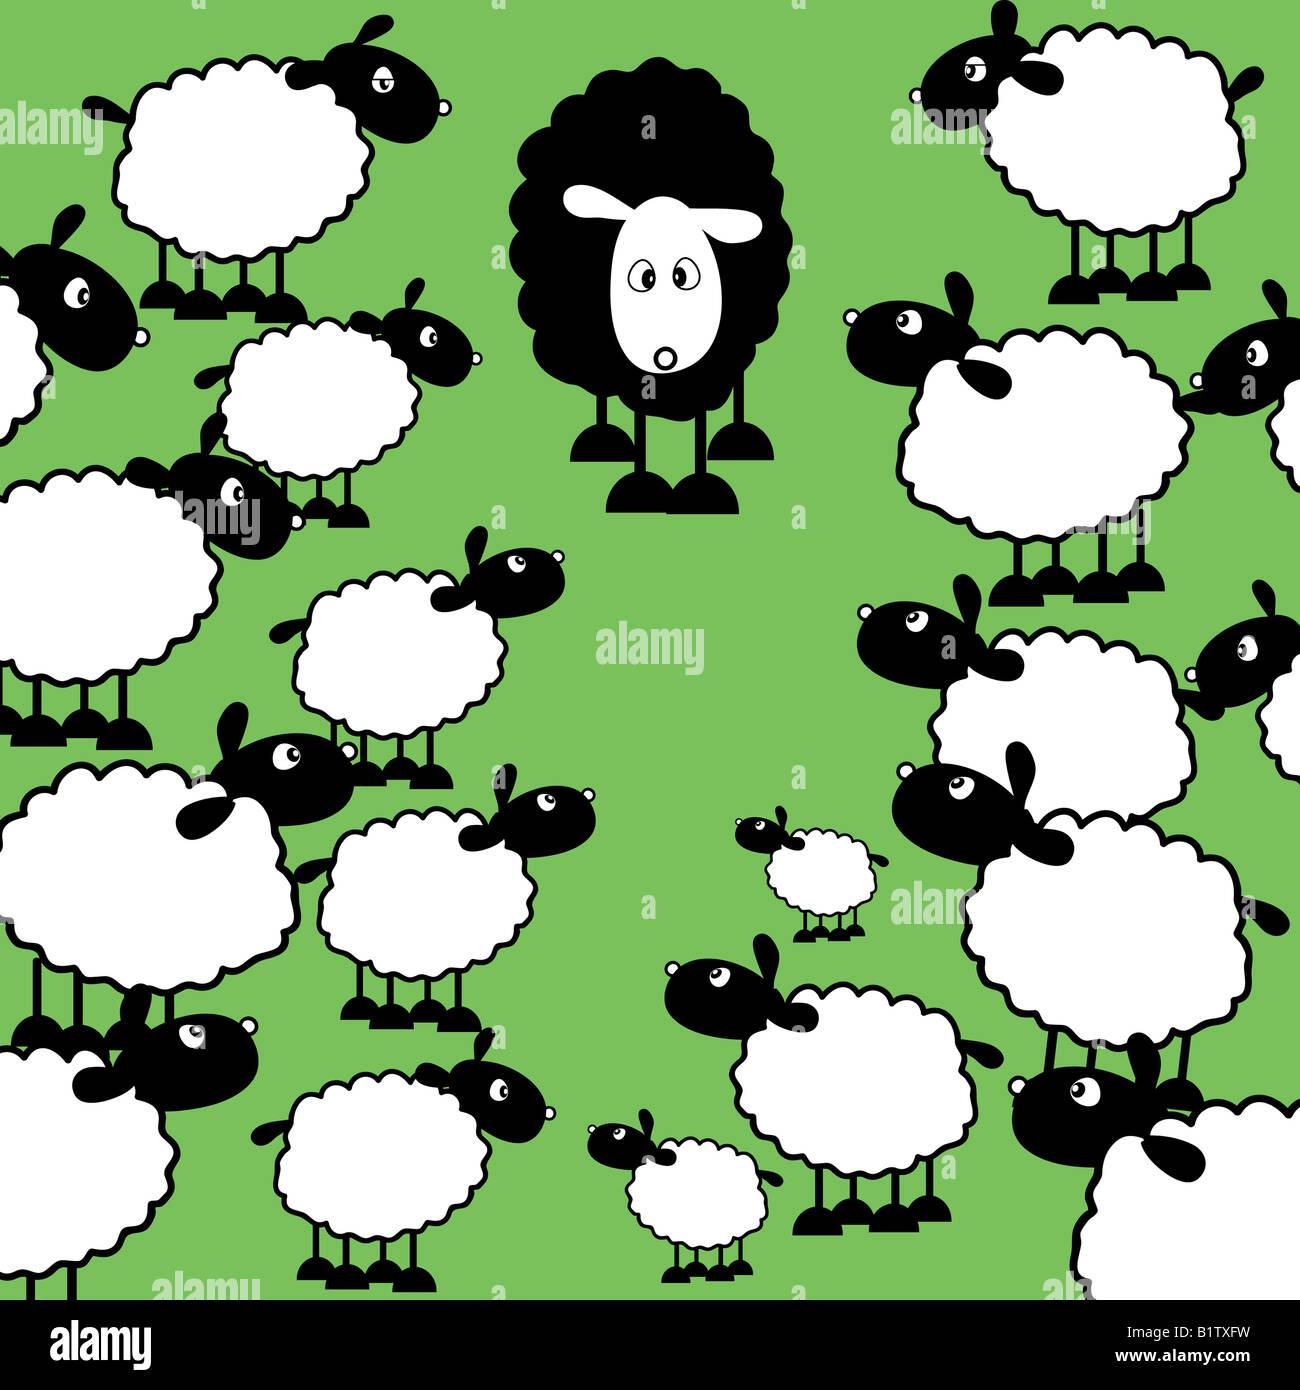 Una oveja negra entre un montón de ovejas blancas Imagen De Stock